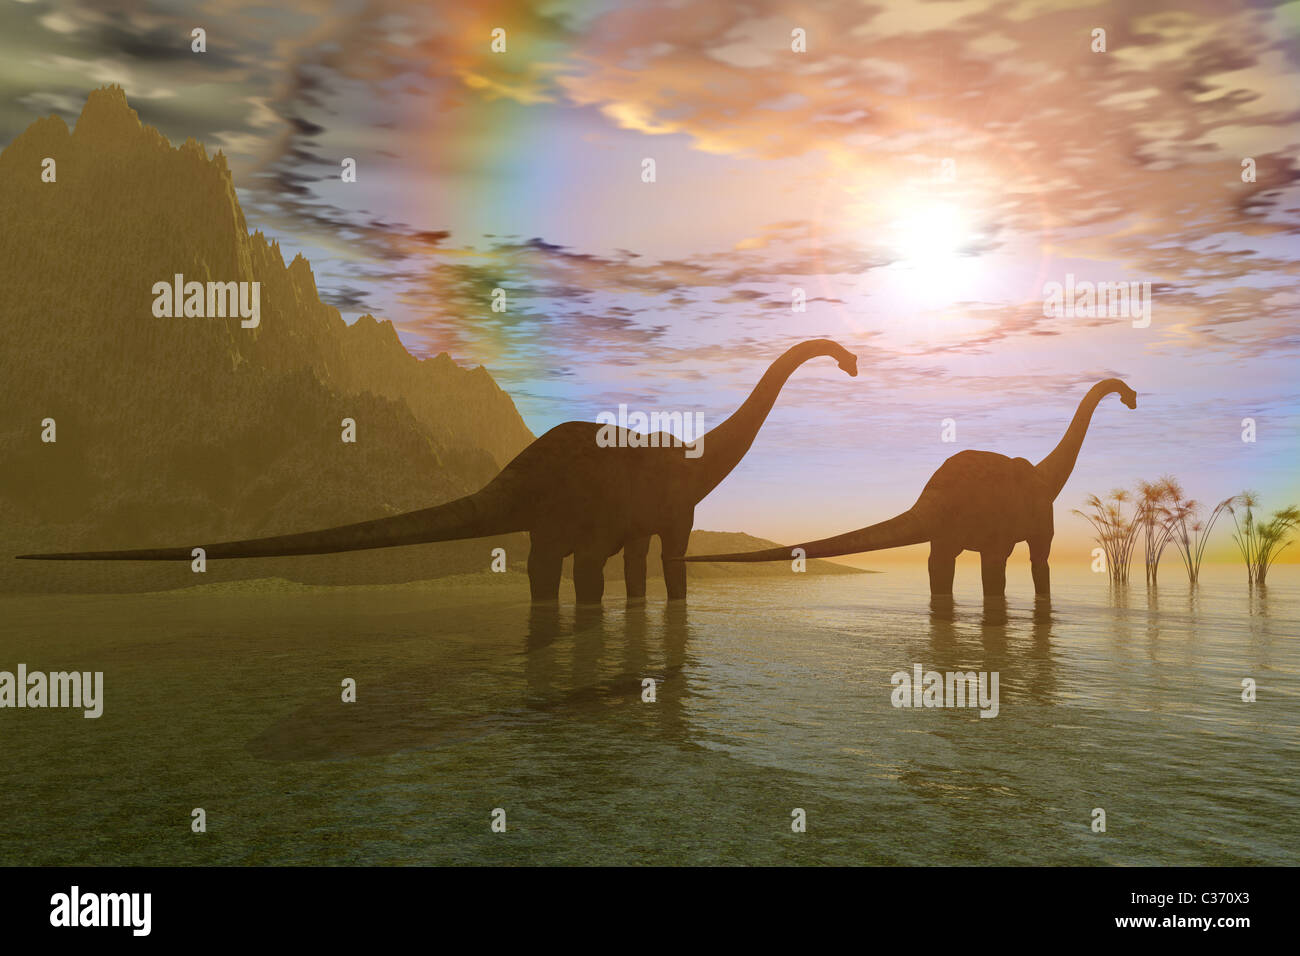 Two Diplodocus dinosaurs wade through shallow water to eat some vegetation. - Stock Image